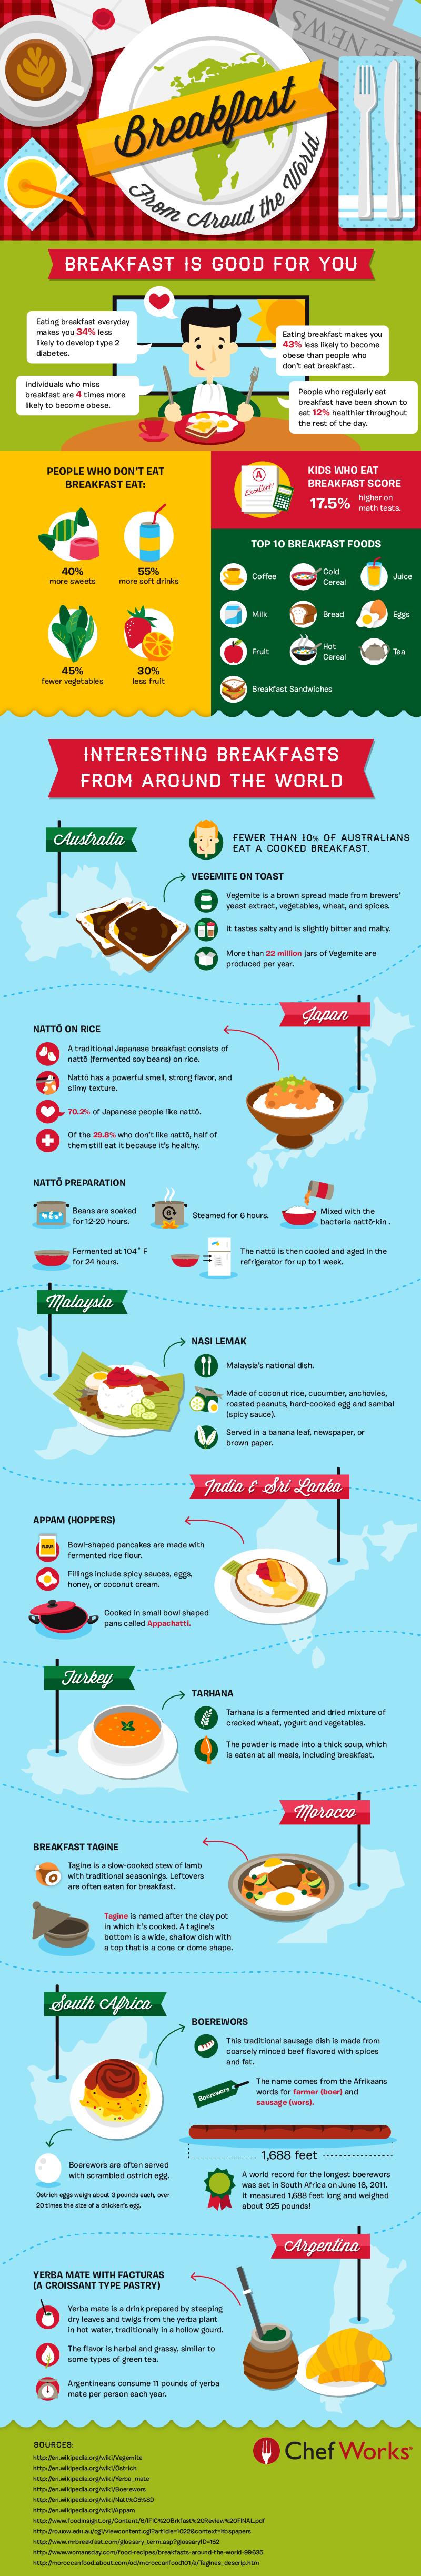 Global Breakfast Trends